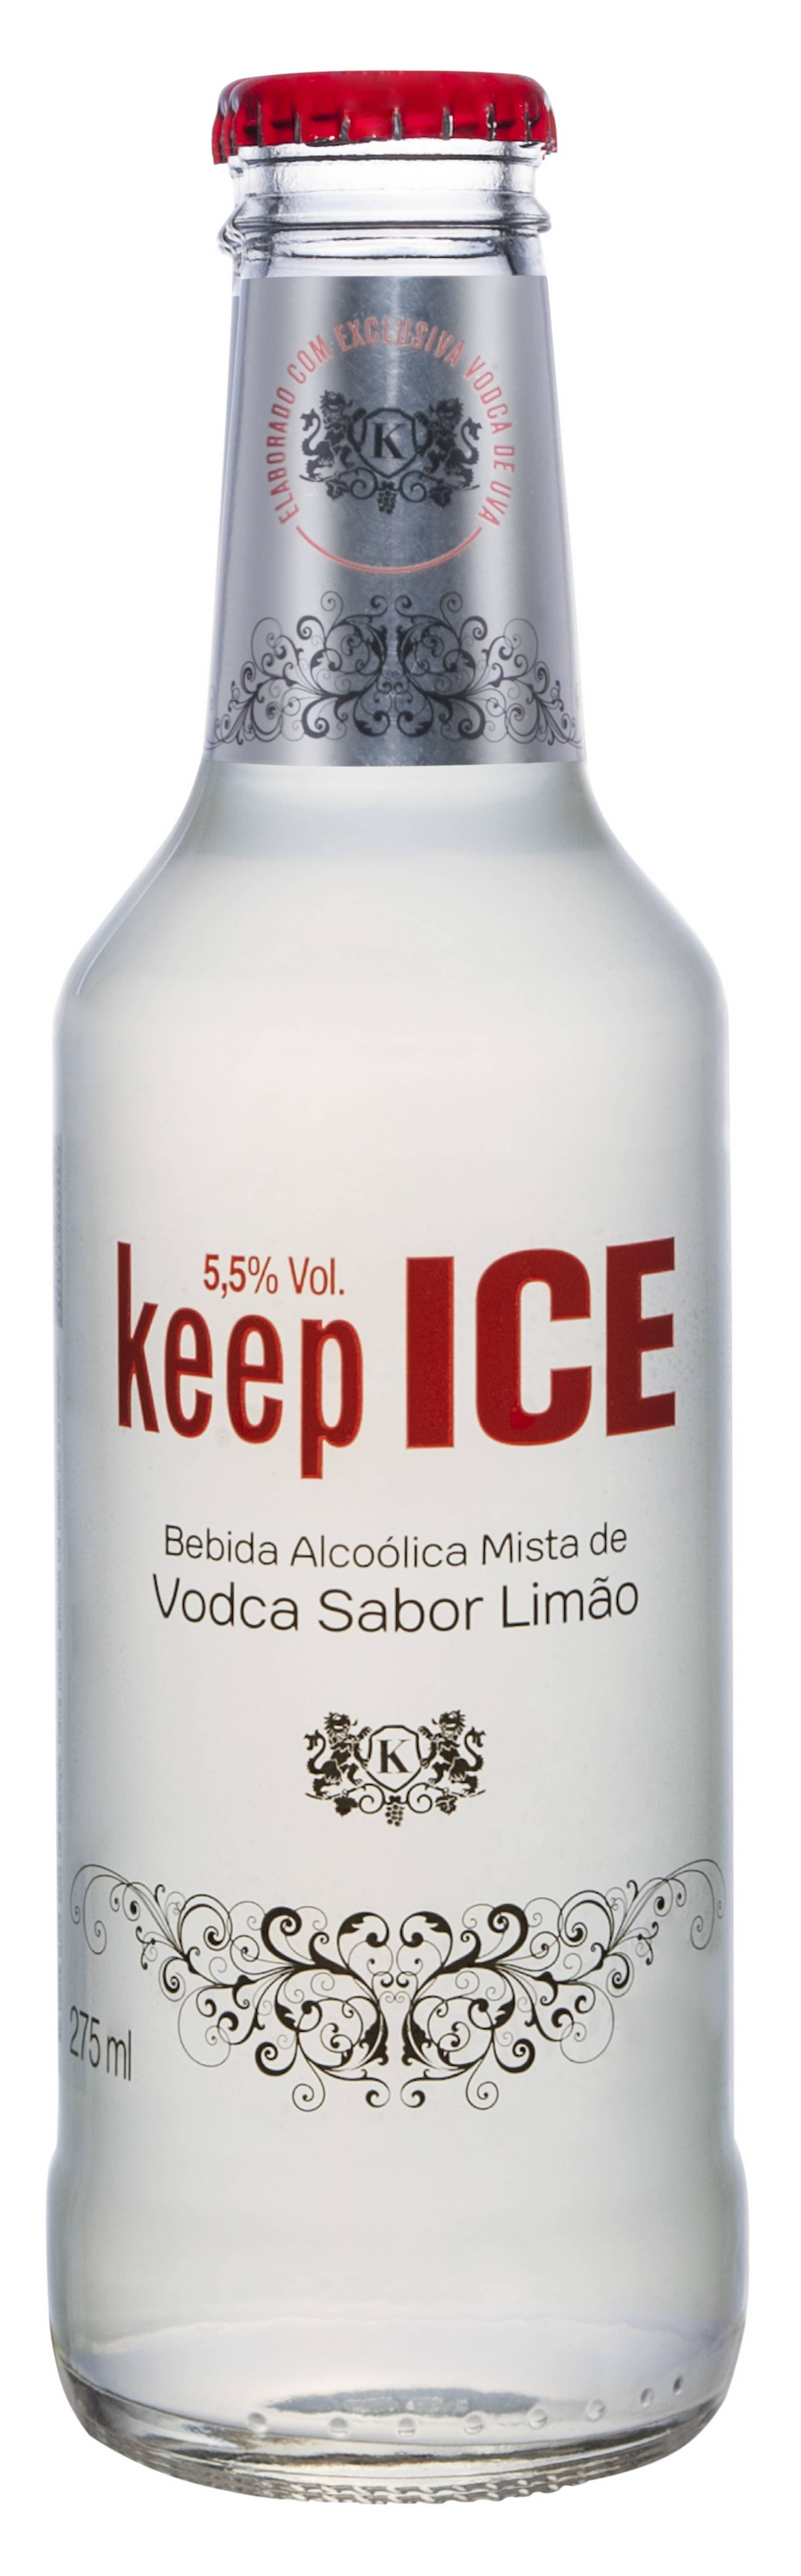 Keep-Ice